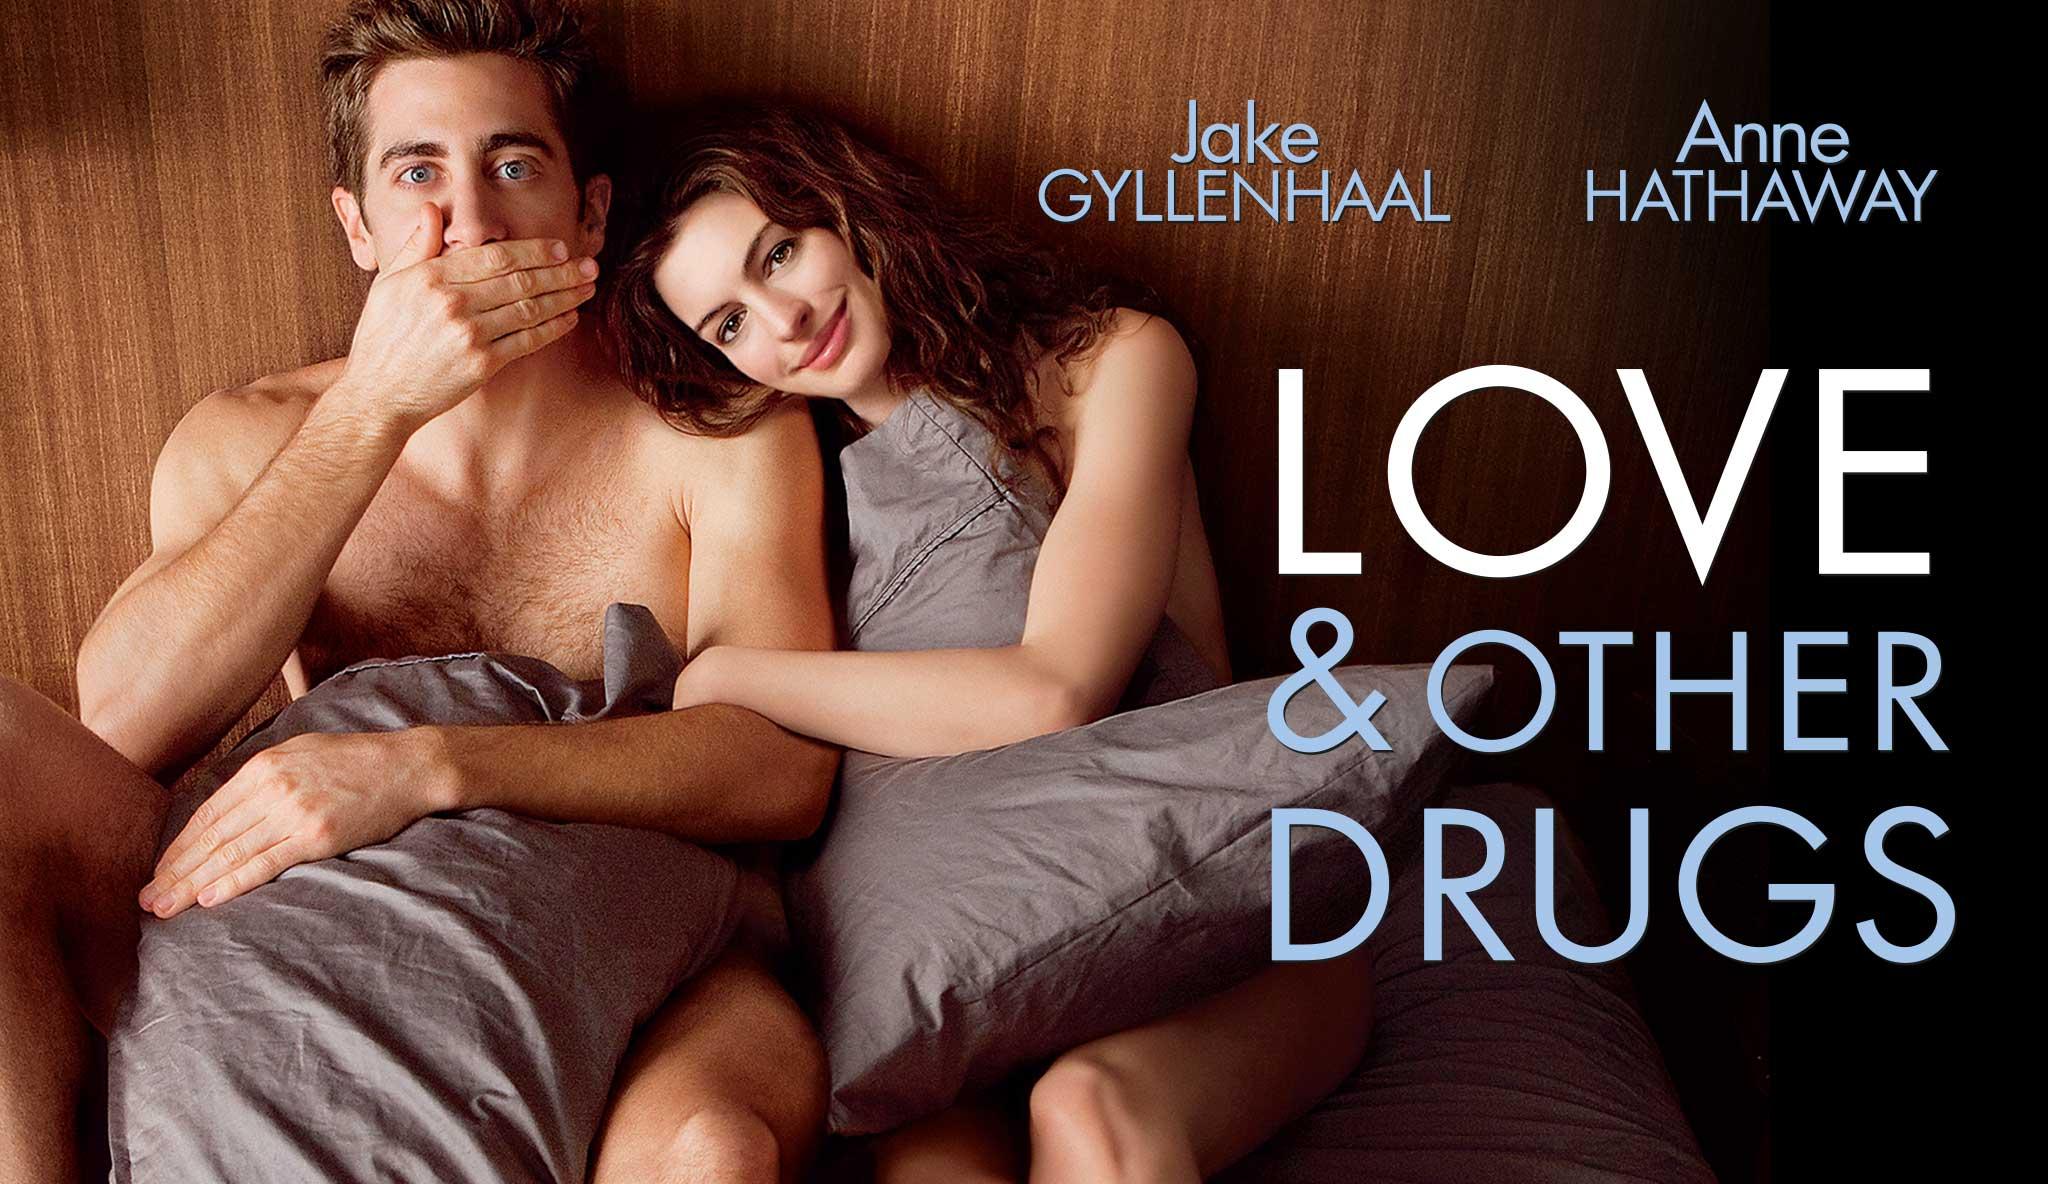 love-and-other-drugs-nebenwirkung-inklusive\header.jpg